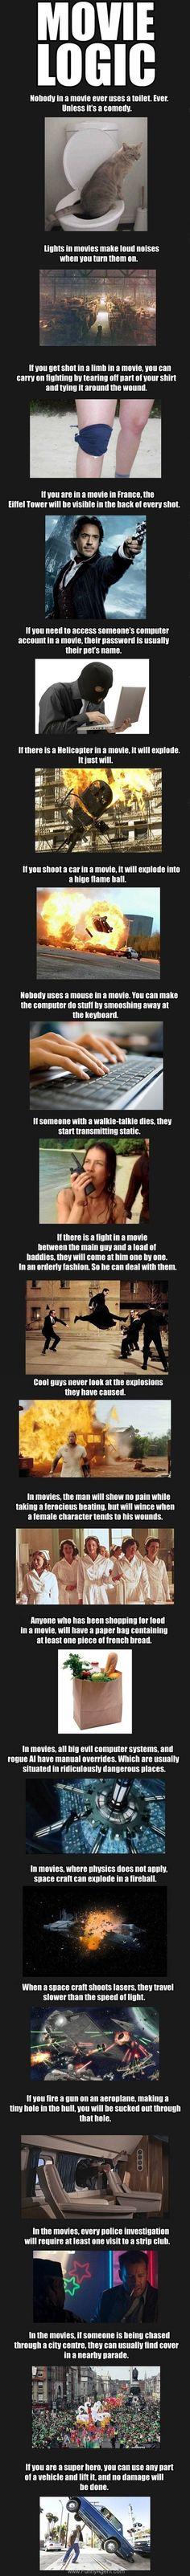 Funny Movies Logic